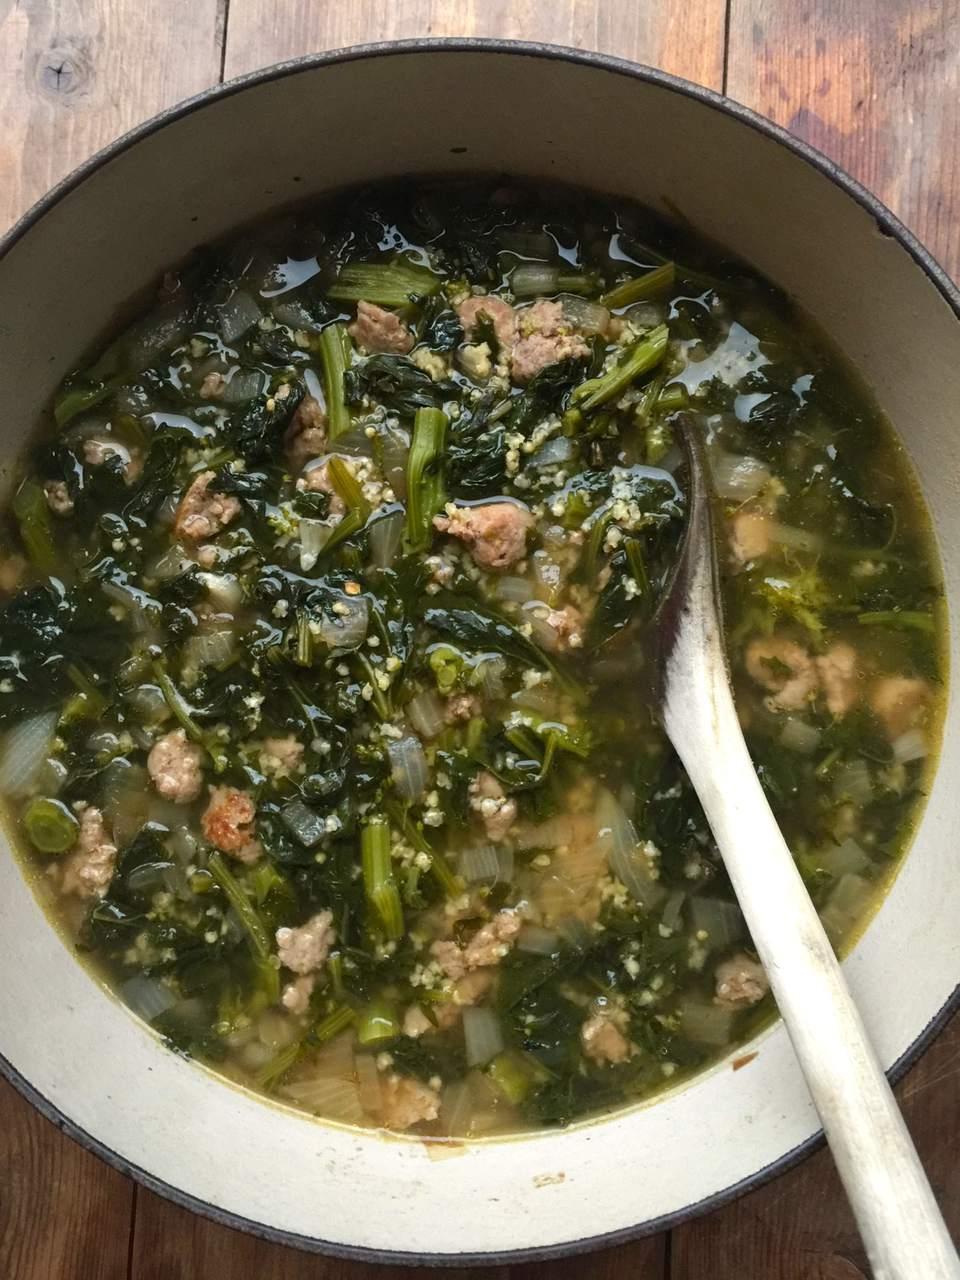 Turkey Sausage, Broccoli Rabe and Millet Soup